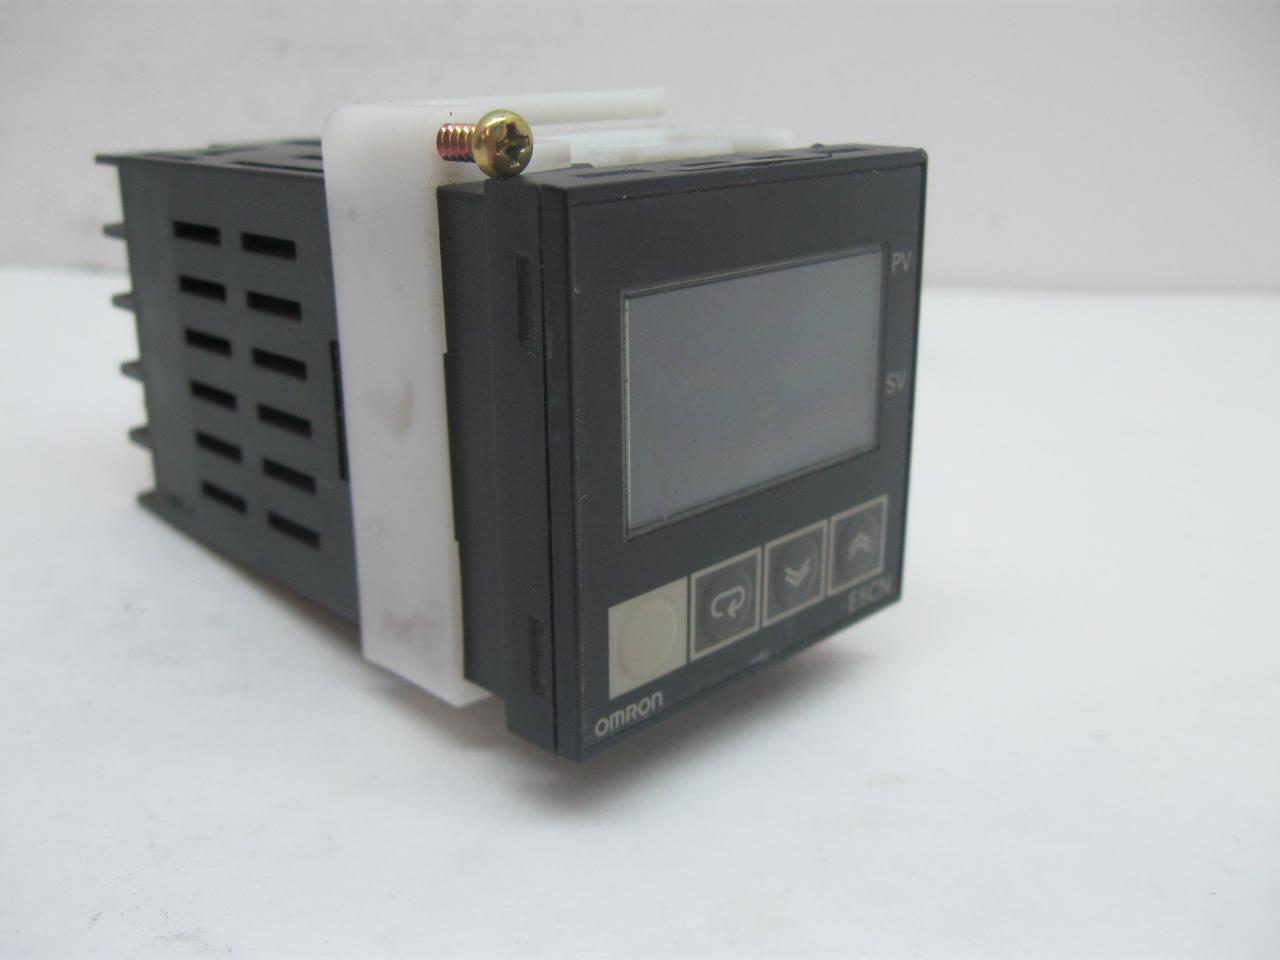 omron temperature controller wiring diagram 2006 chrysler 3 8 engine e5cn r2p ebay